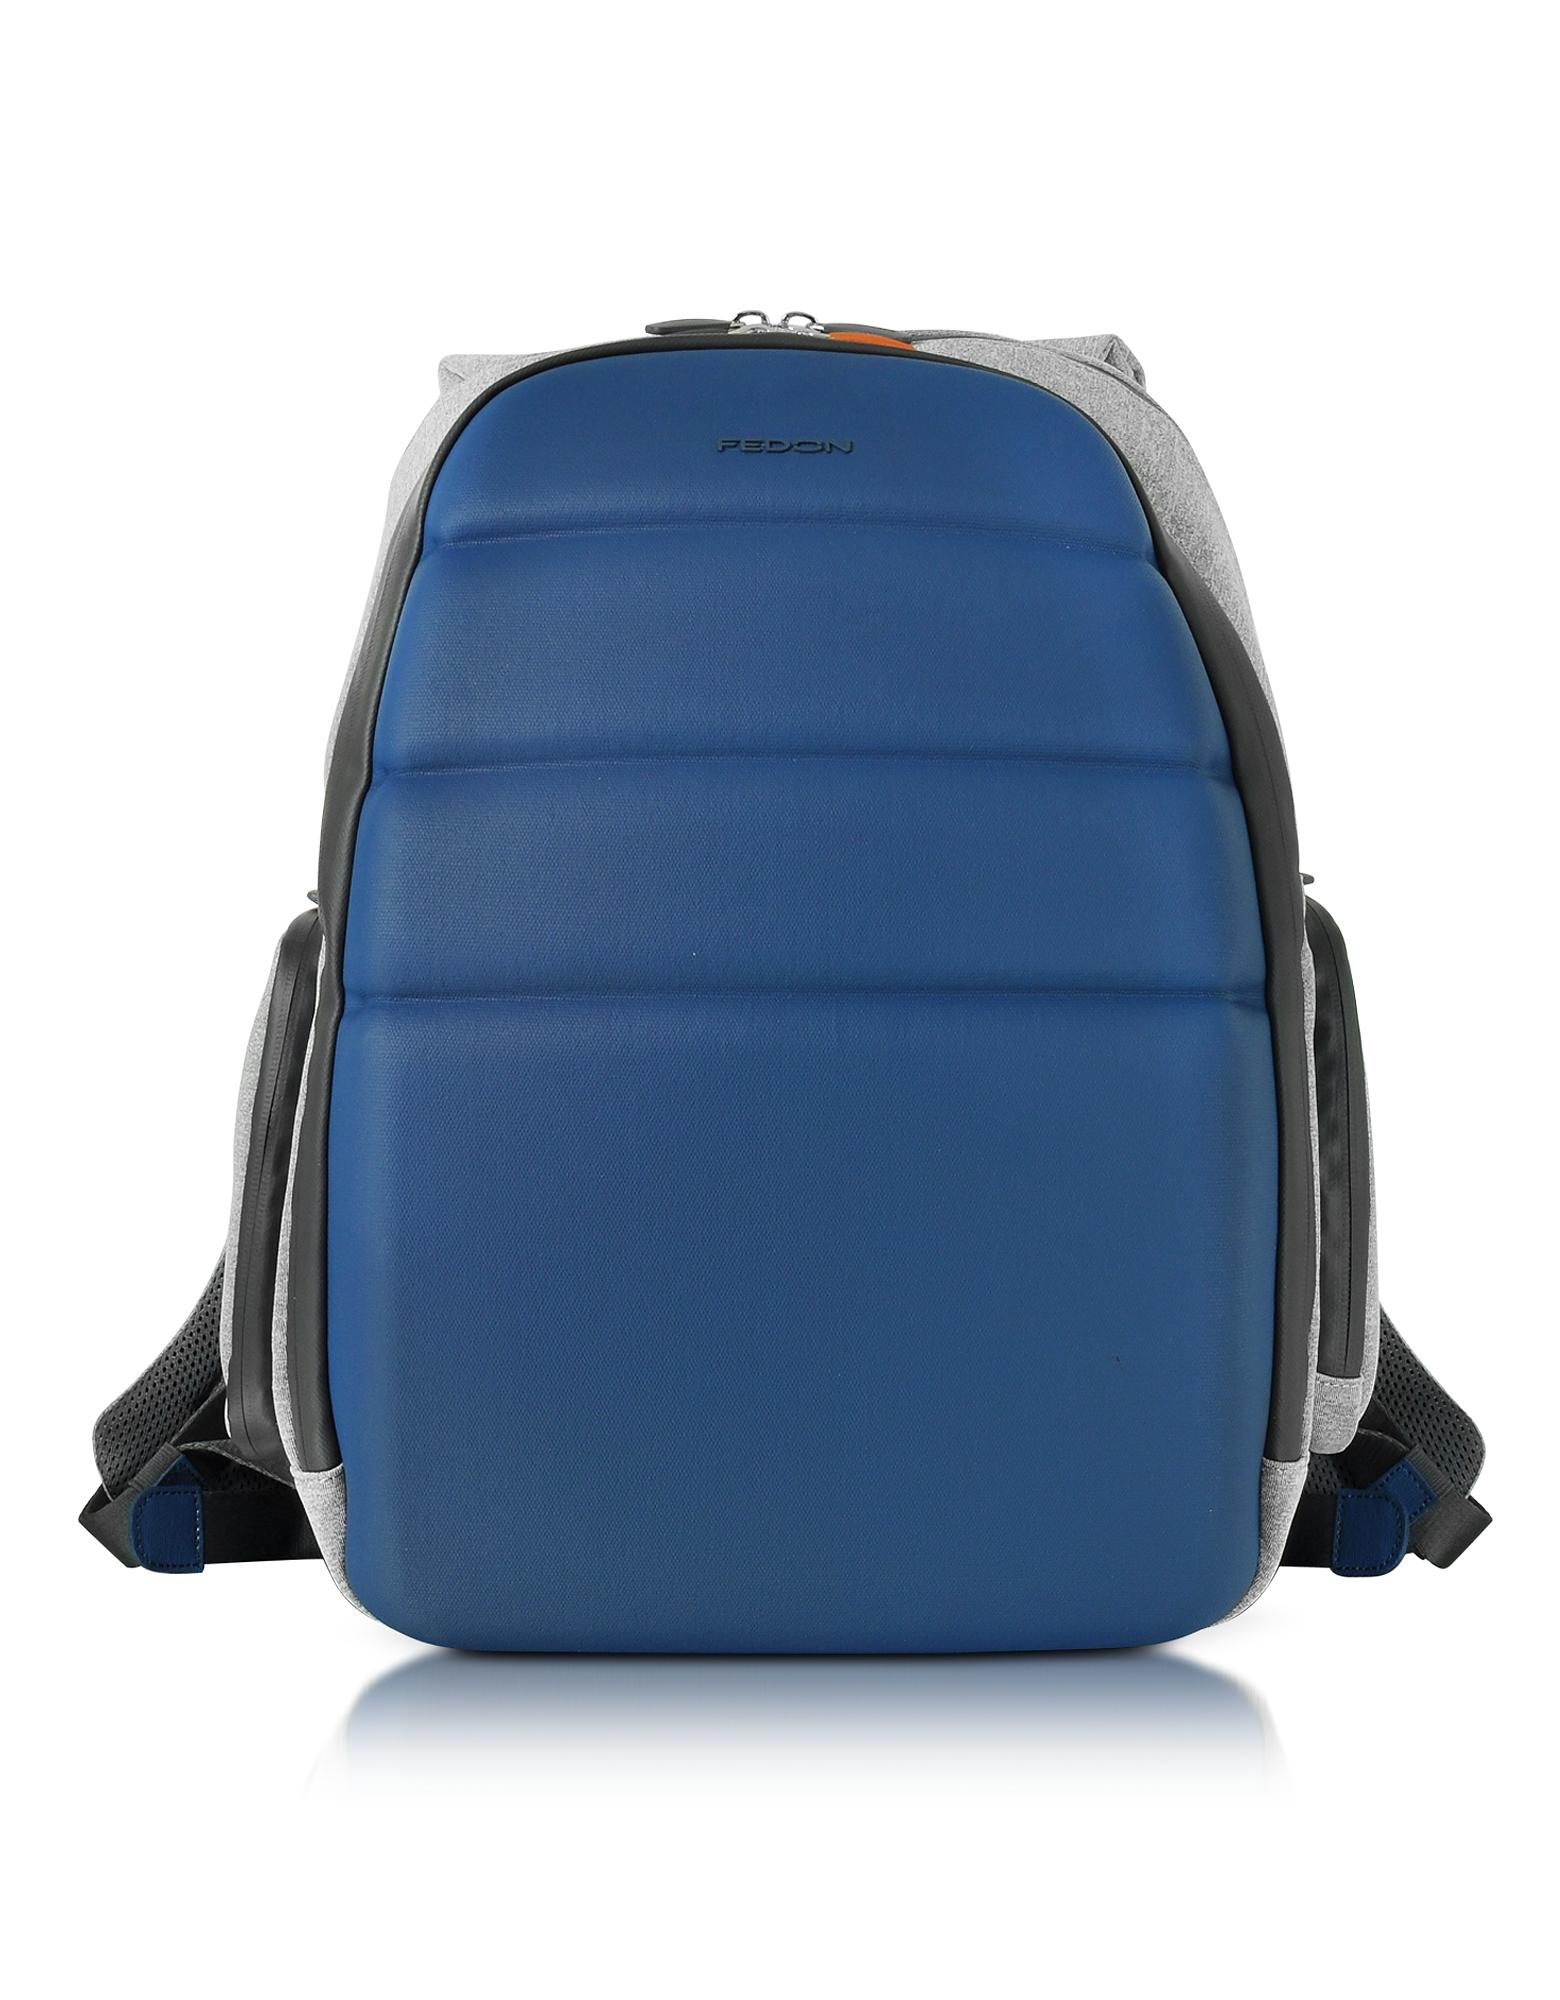 "Giorgio Fedon 1919 Backpacks, Ninja Black Coated Jersey Backpack w/13"" Laptop Compartment"